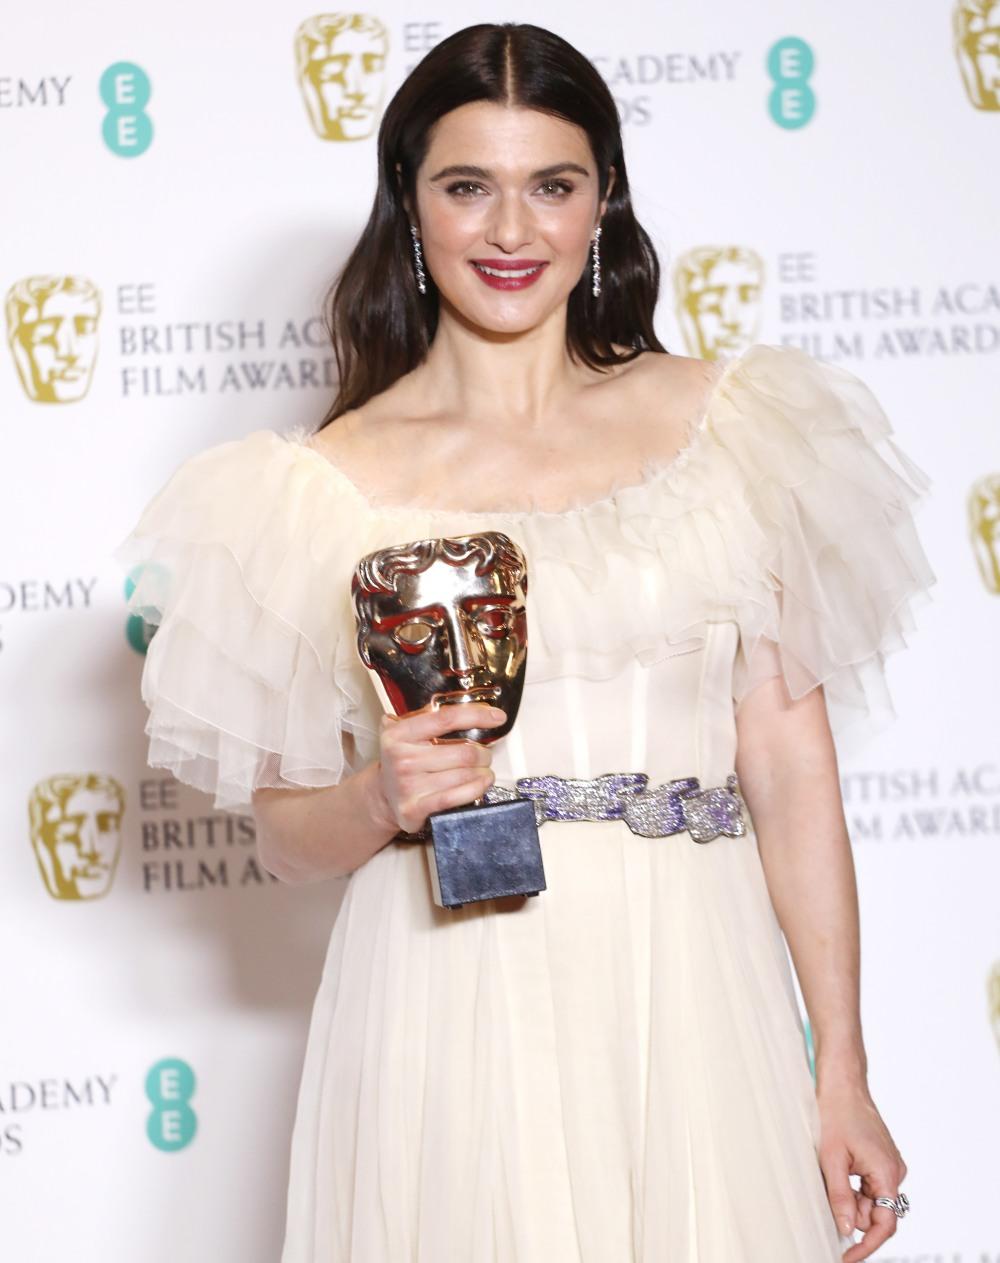 The EE British Academy Film Awards winners